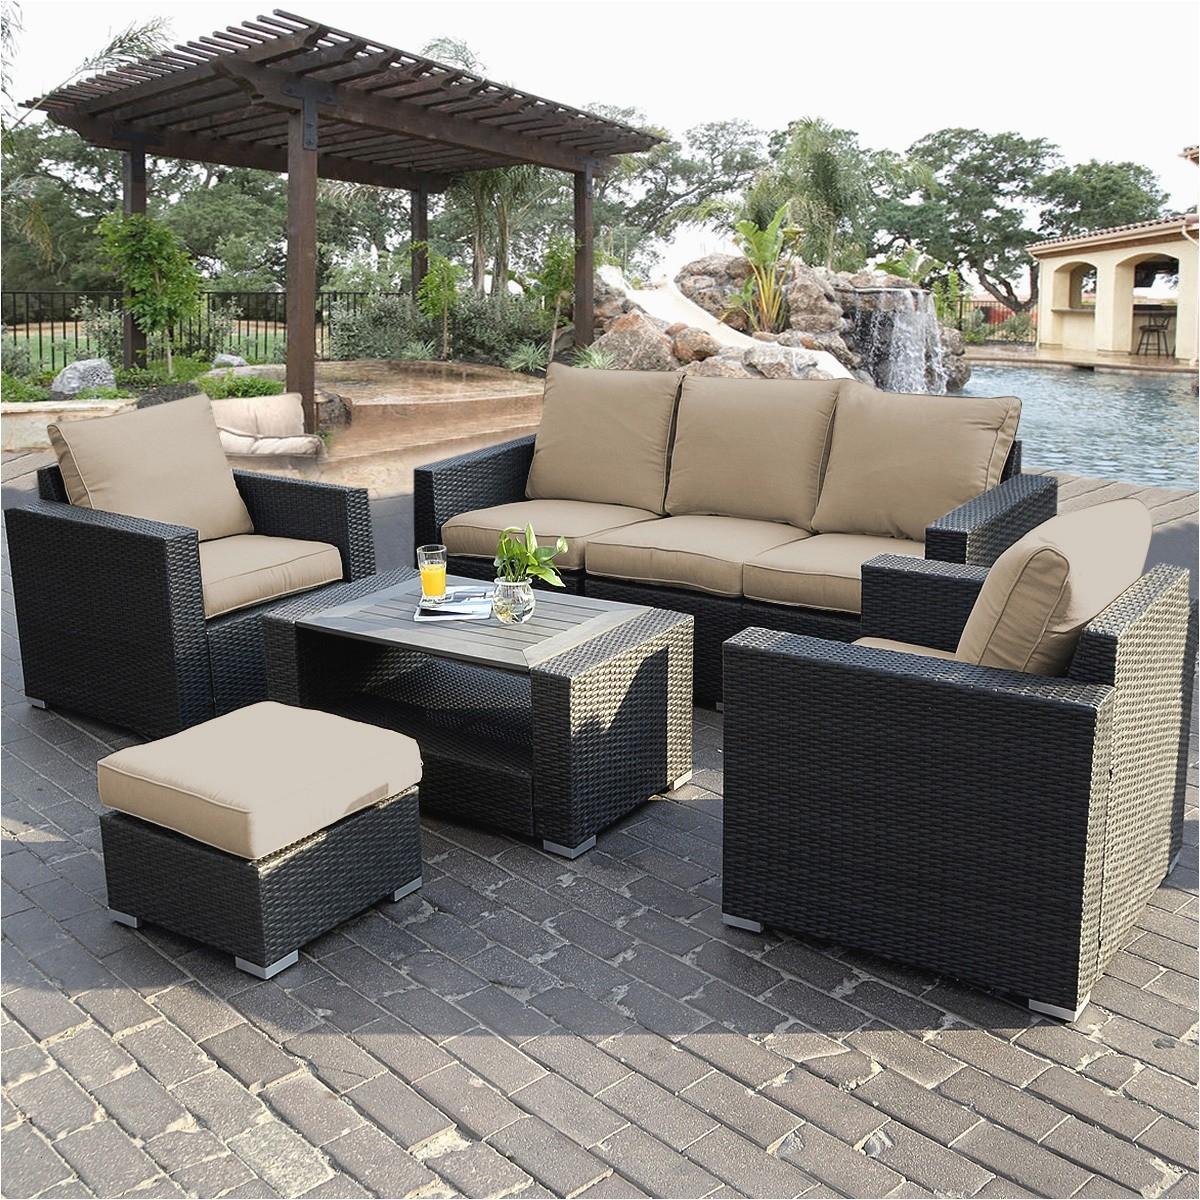 Mayfair Com Furniture Mayfair Patio Furniture Luxury Unique Outdoor Furniture Set